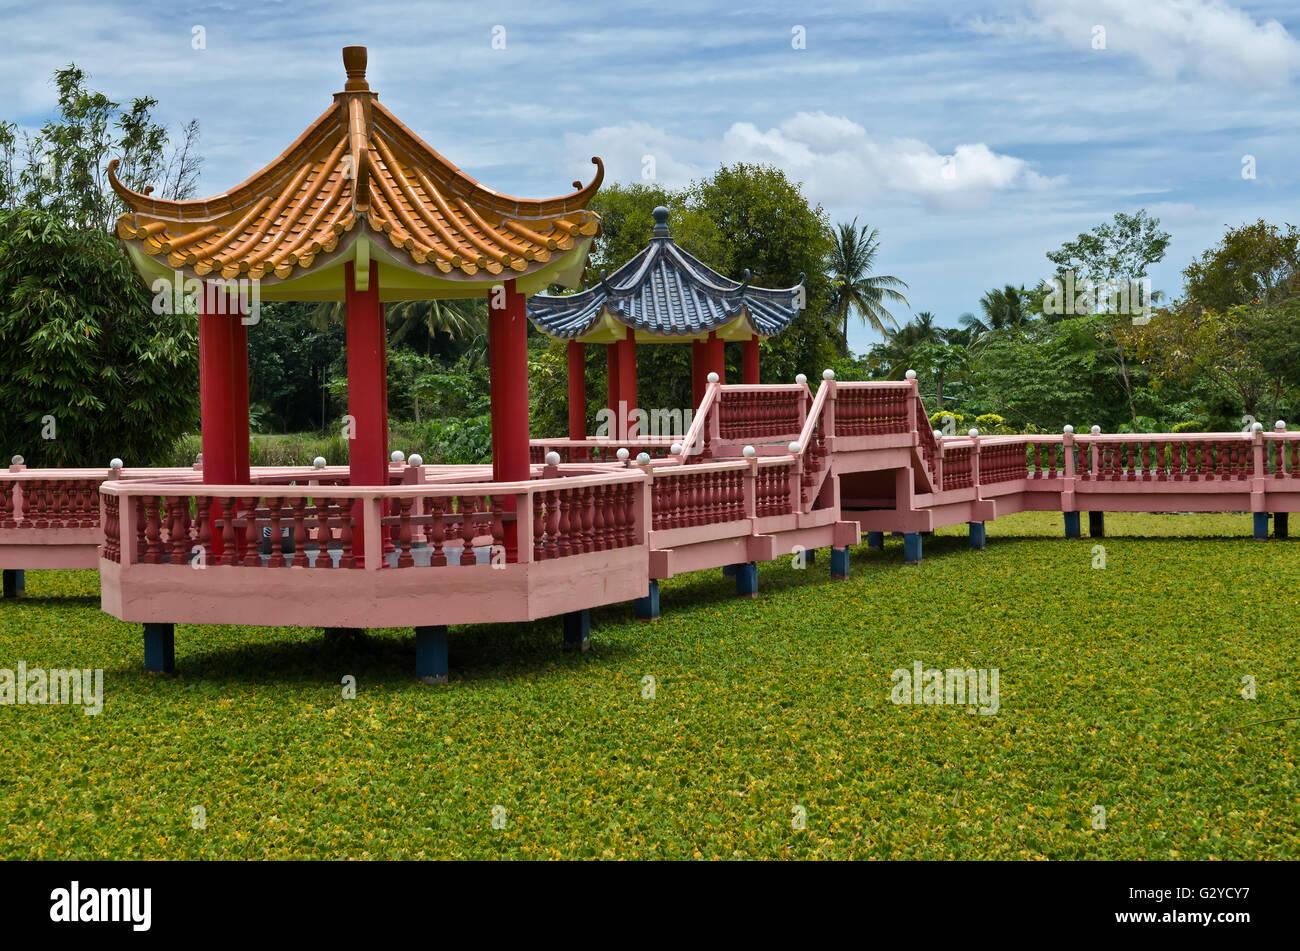 Taman Rekreasi Tasik Melati, Perlis, Malaysia - Tasik Melati is a wetland  famous for its lakes and its recreational - Stock Image